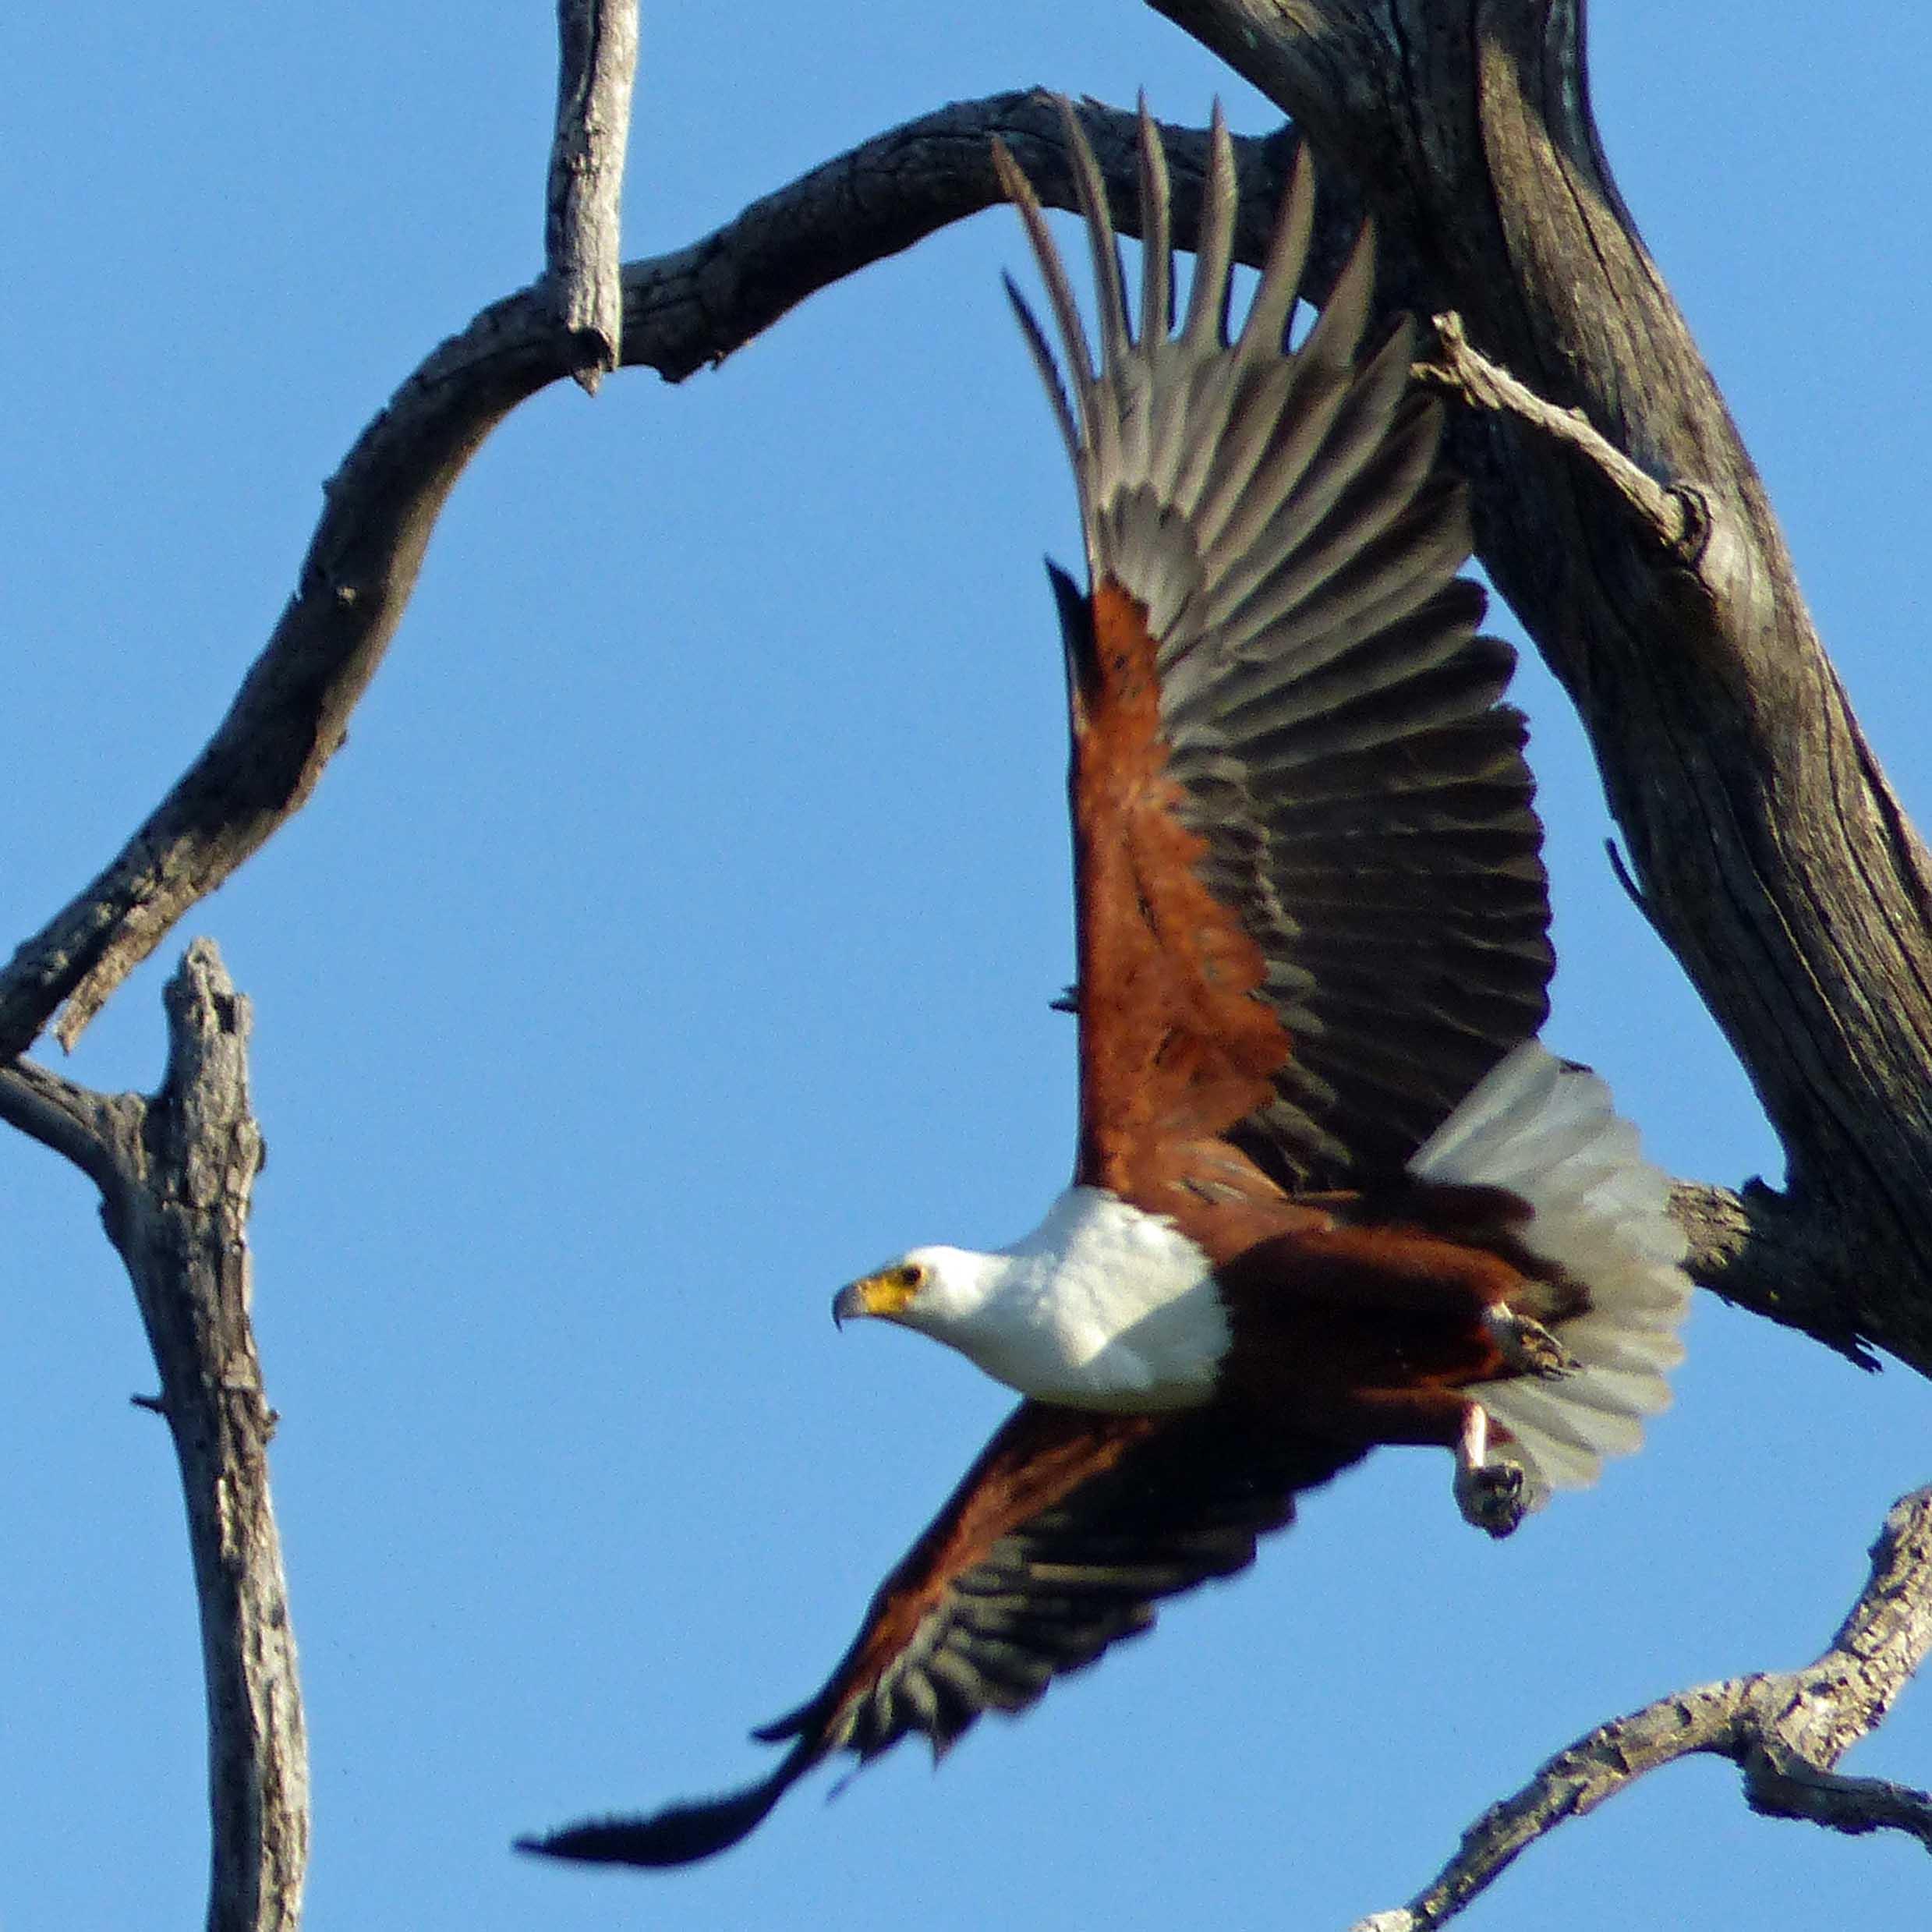 Brown eagle in flight past a dead tree